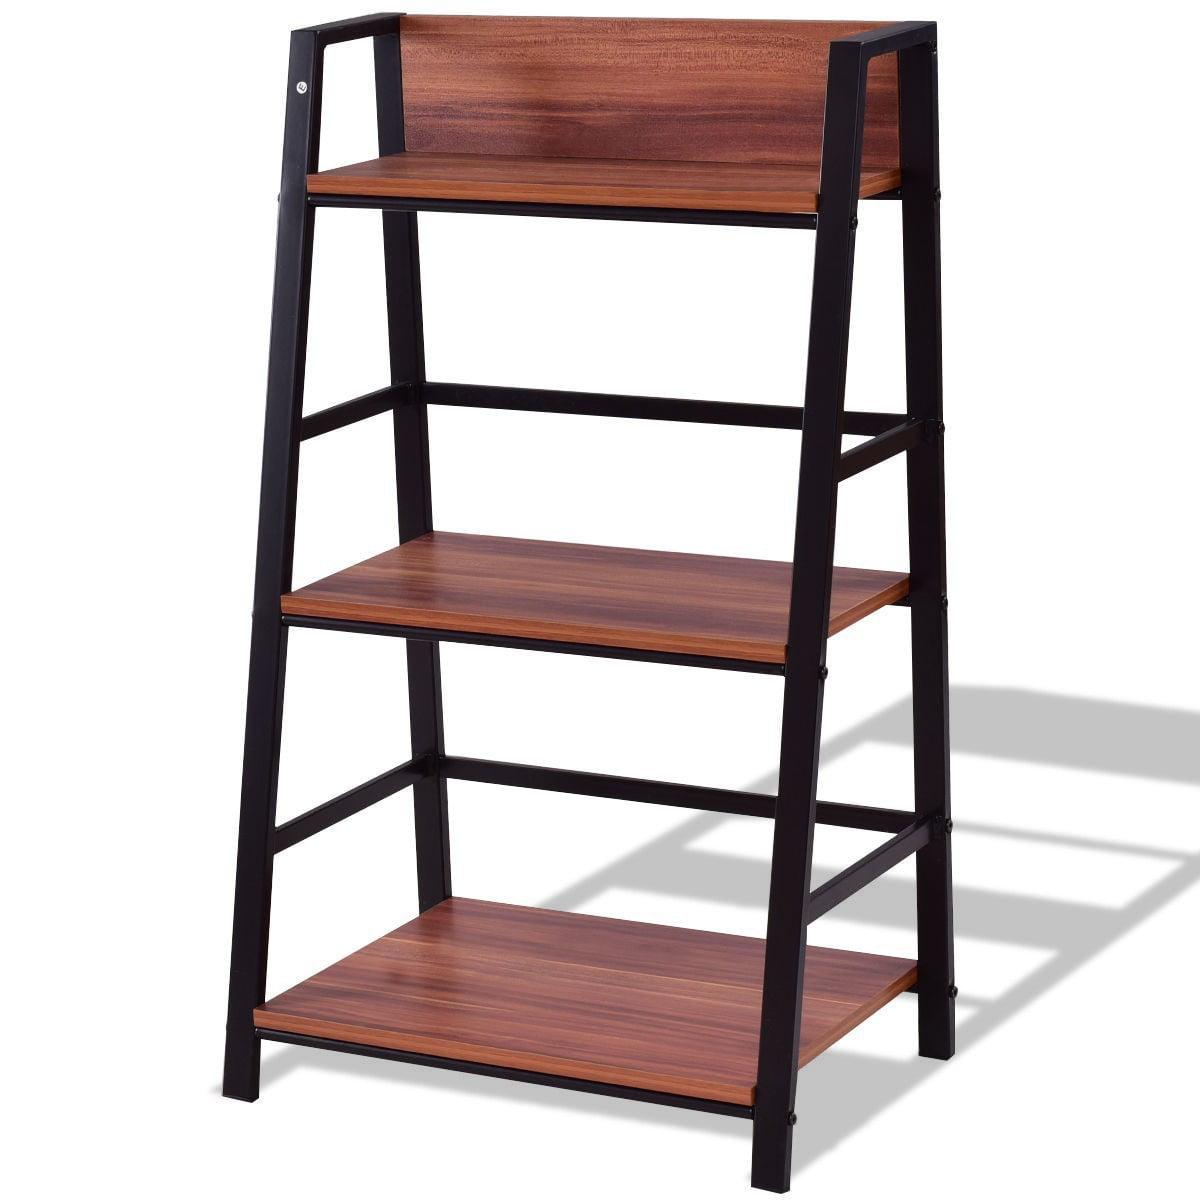 3-Tier Modern Ladder Bookshelf